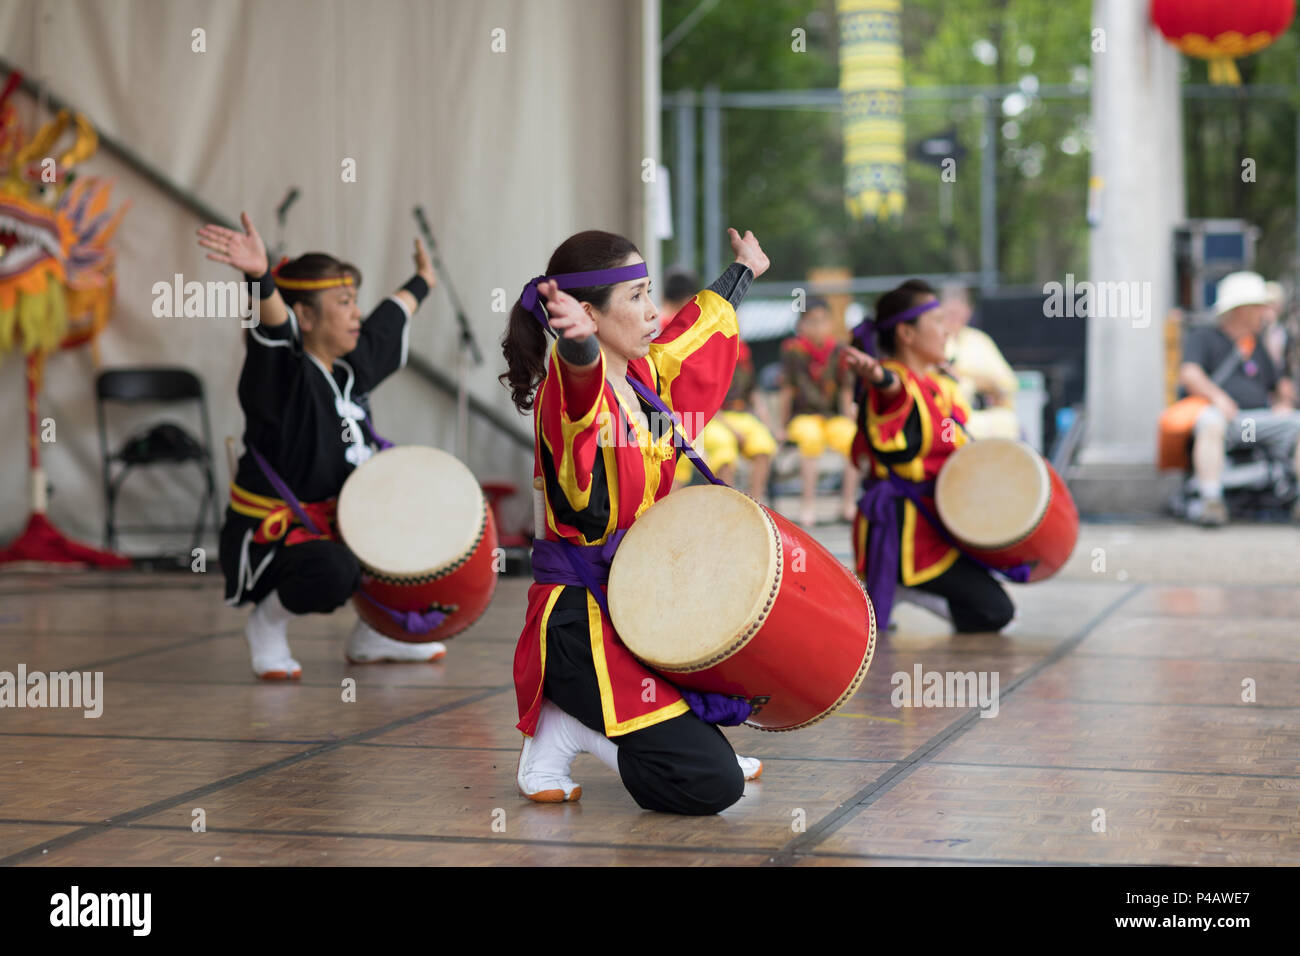 Columbus, Ohio, USA - May 27, 2018 Members of the Ryukyukoku Matsuri Daiko perform okinawan drum dance at the Asian Festival. - Stock Image